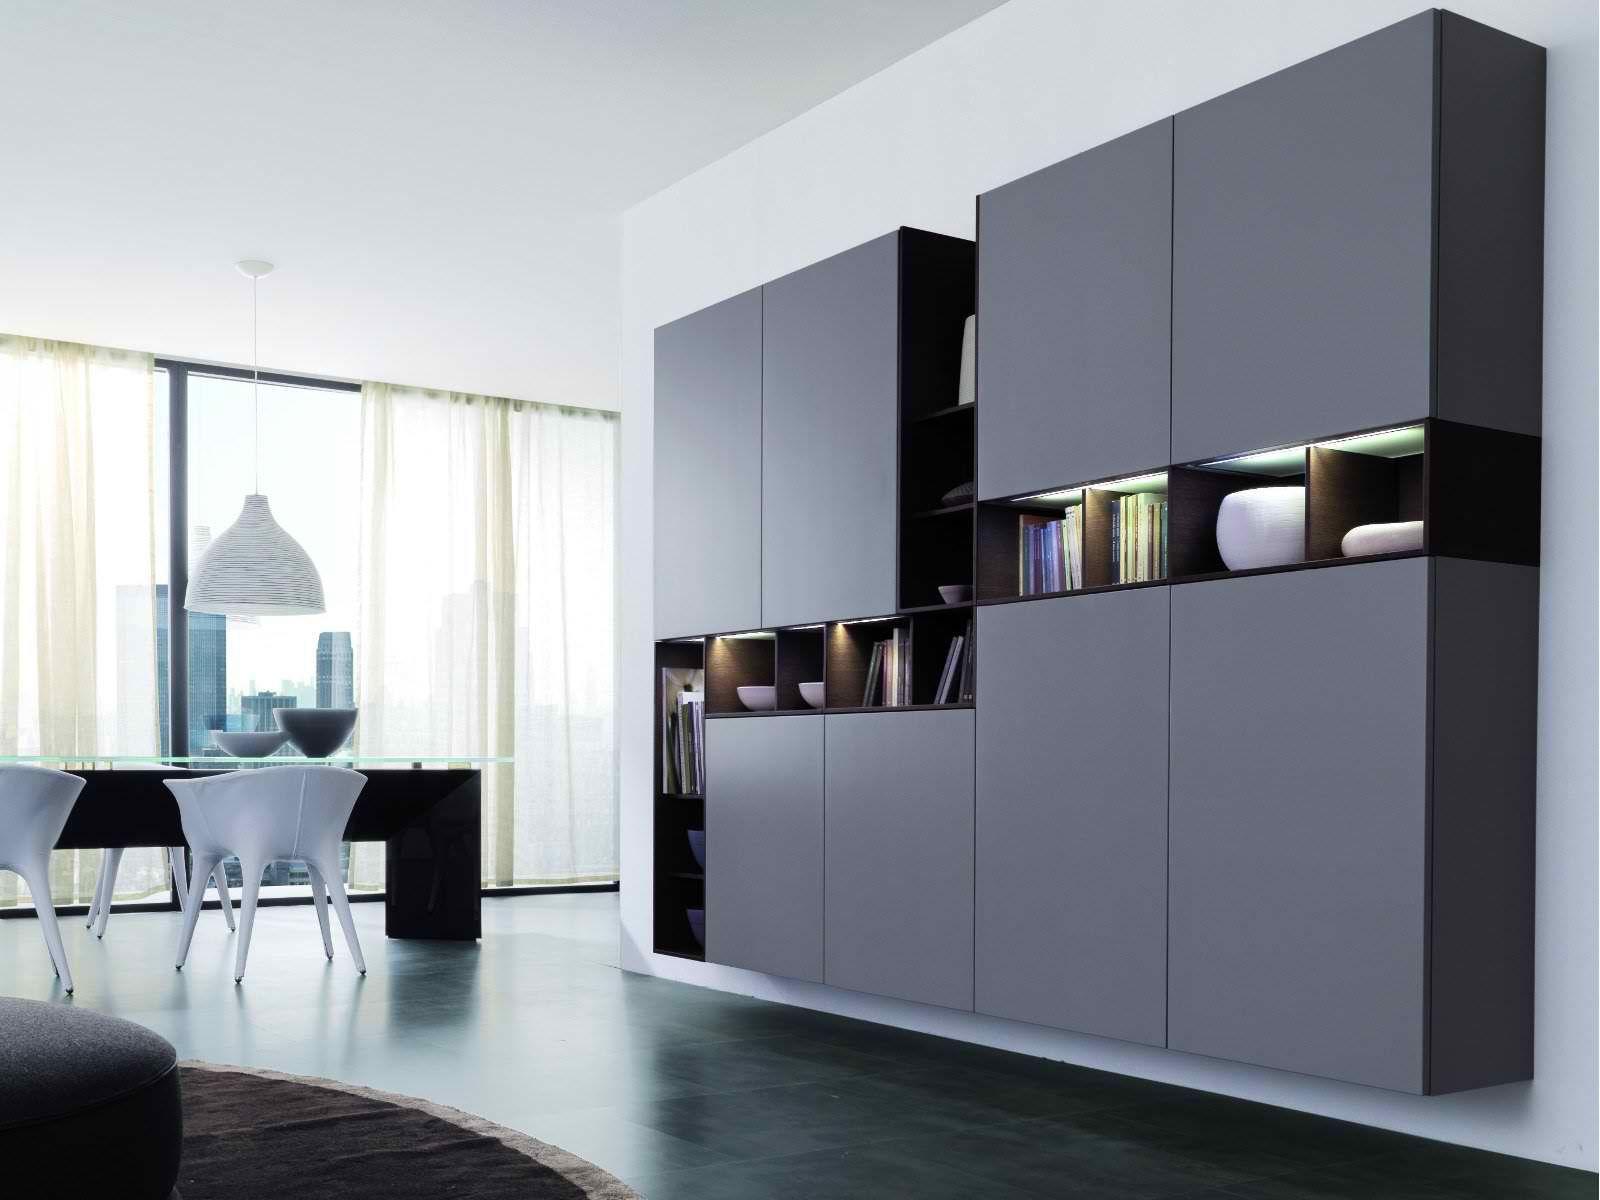 Möbel Im Italienischen Stil Möbel Wall Cabinets Living Room